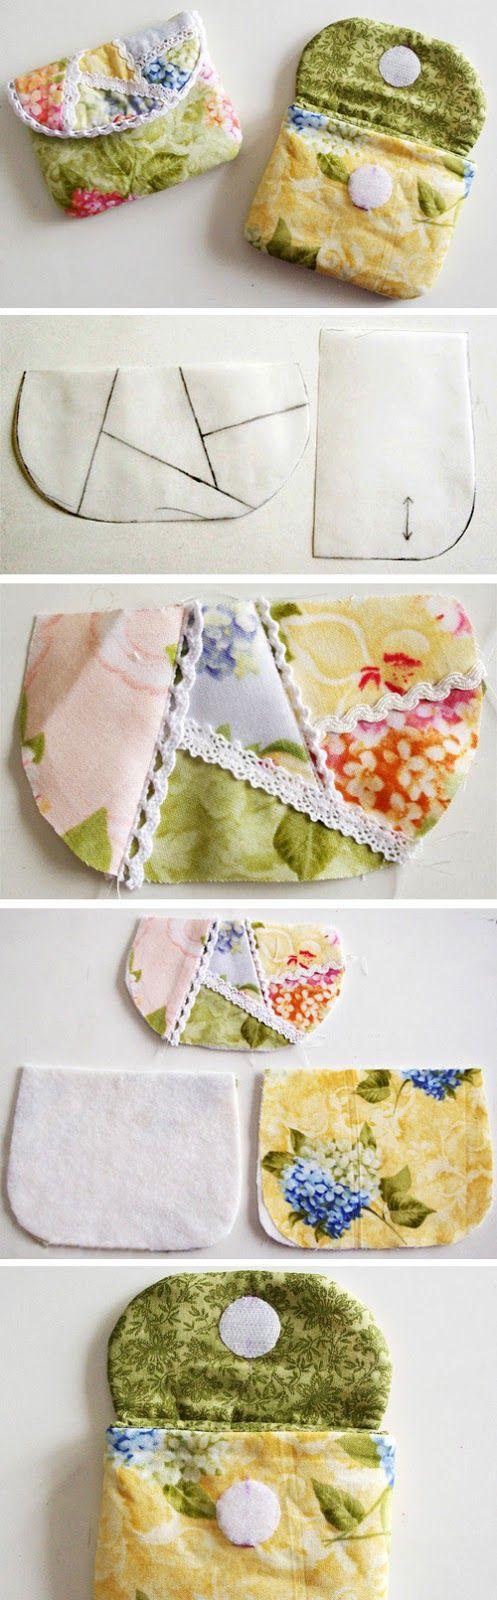 Simple Purse Patchwork. DIY Tutorial in Pictures.  http://www.handmadiya.com/2016/02/simple-purse-patchwork.html